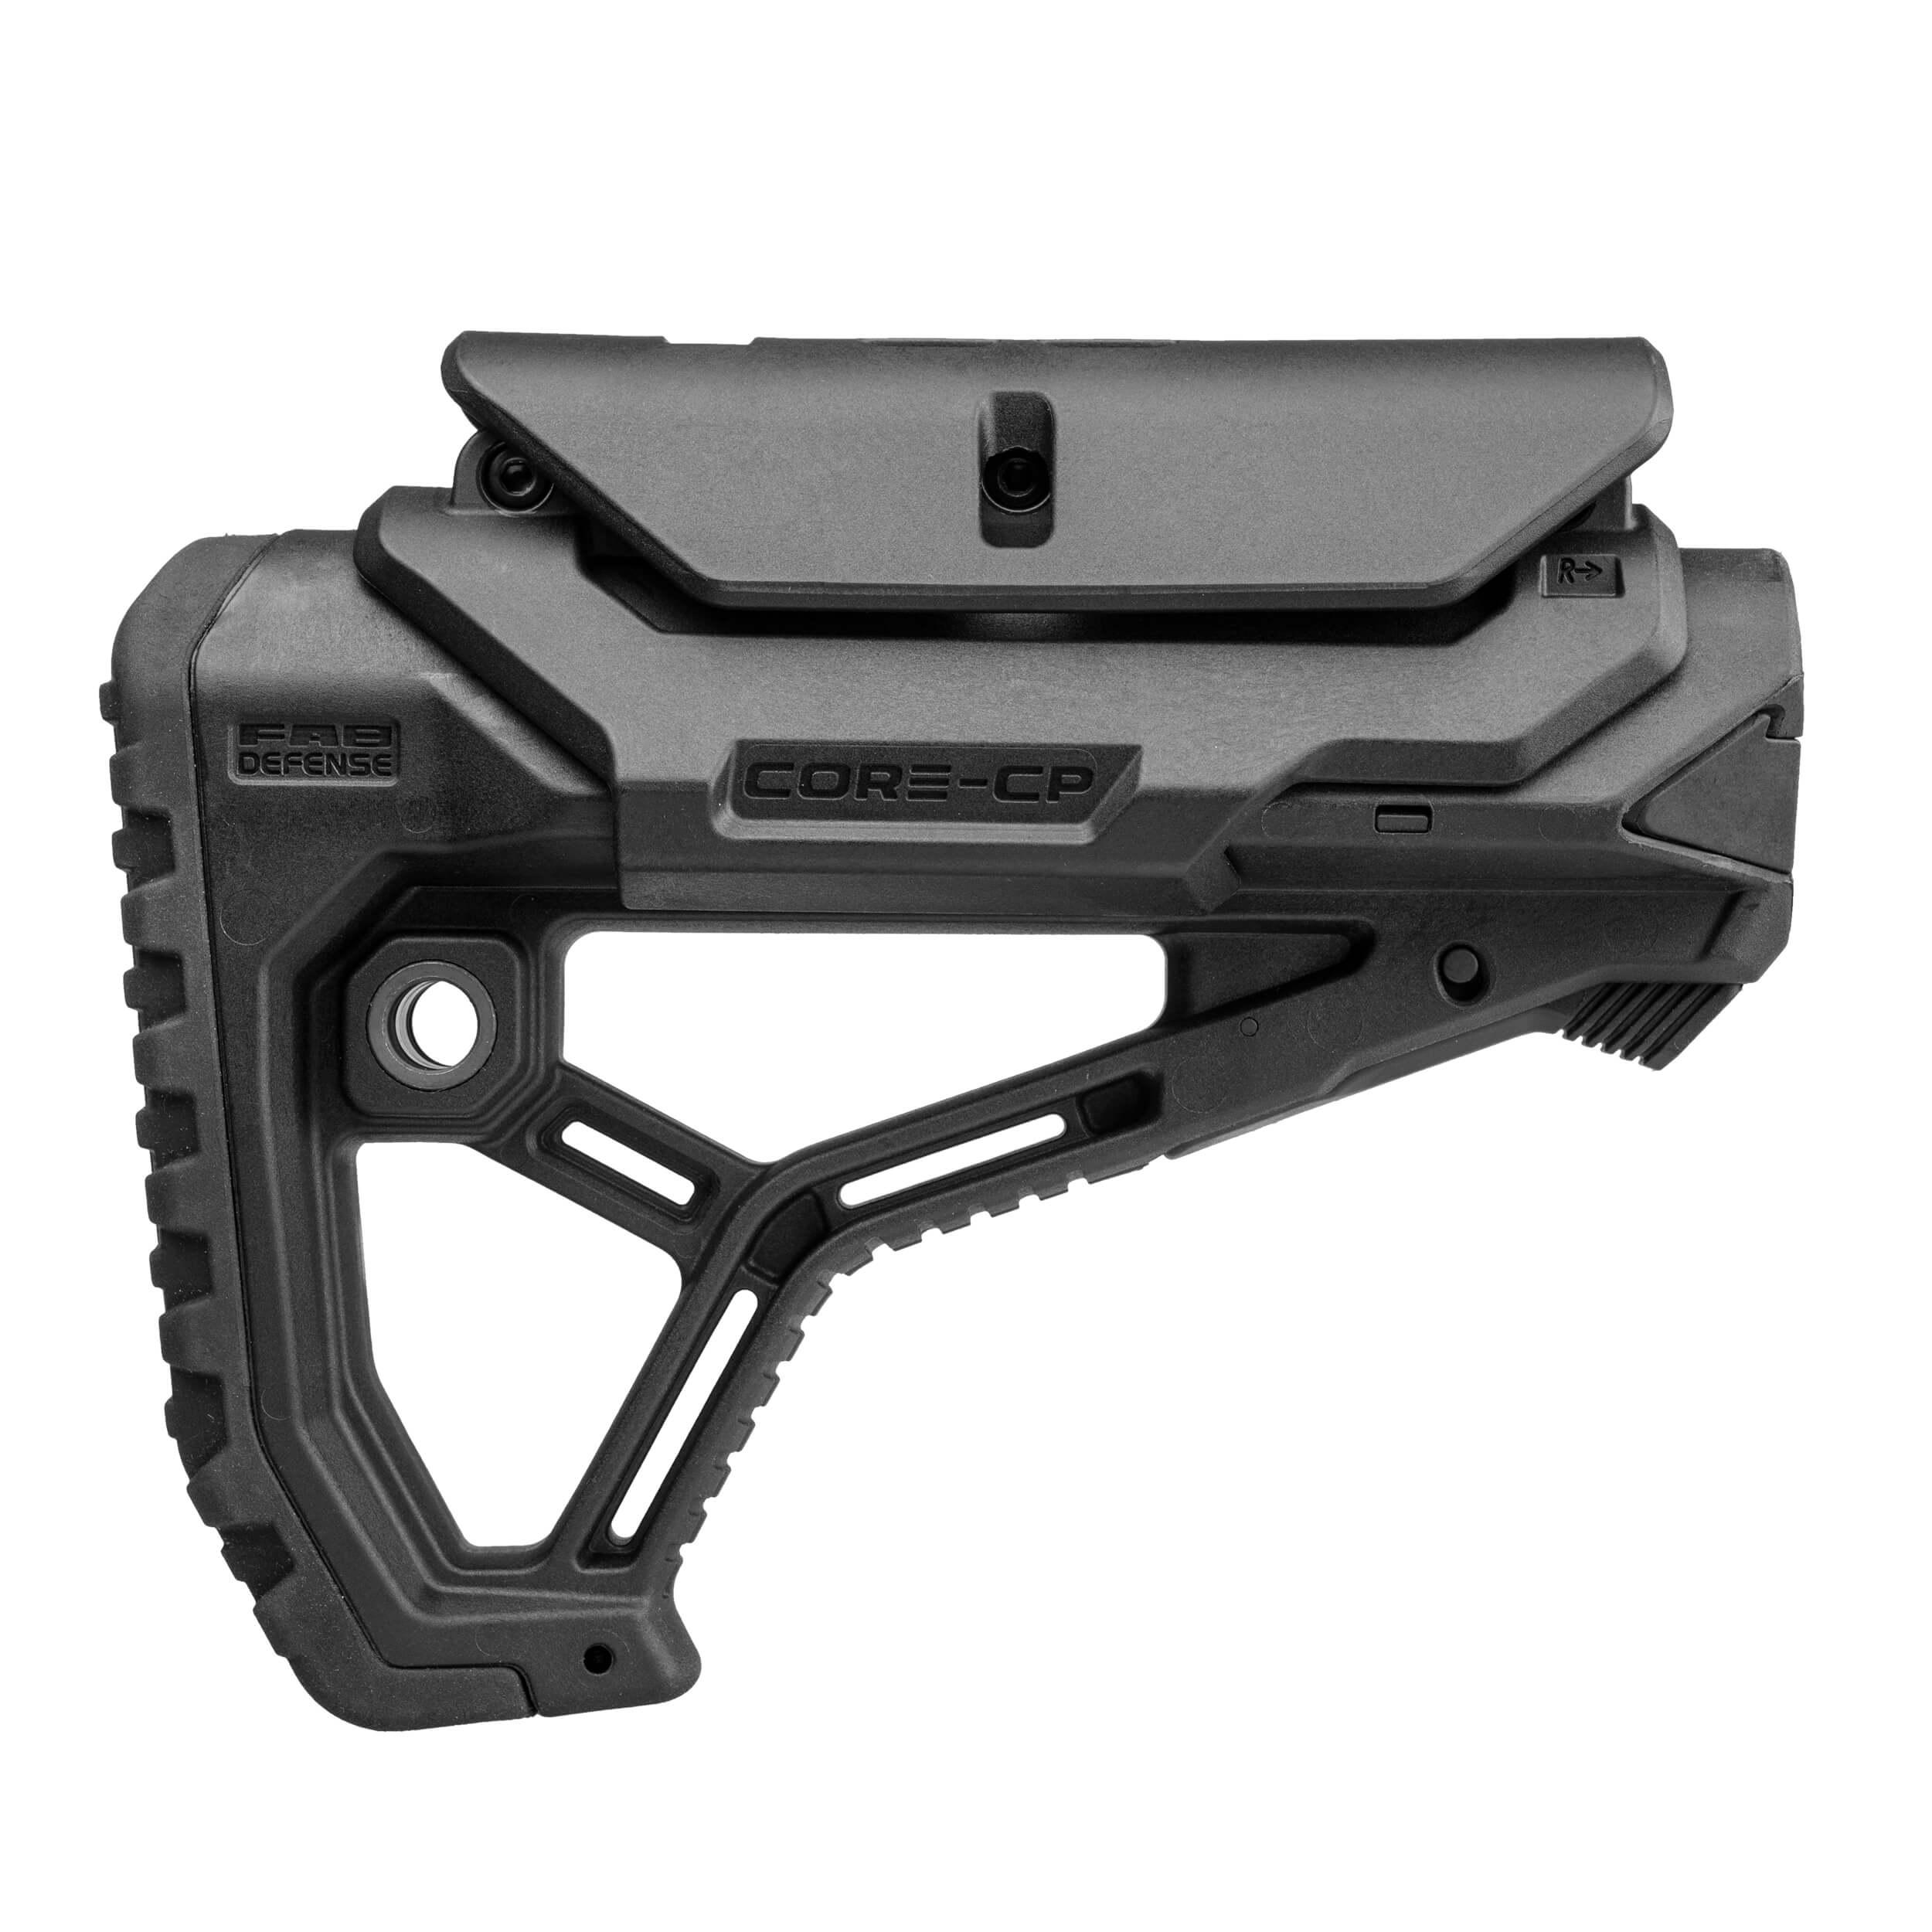 Ergonomic shaped lightweight buttstock  with Cheek Rest